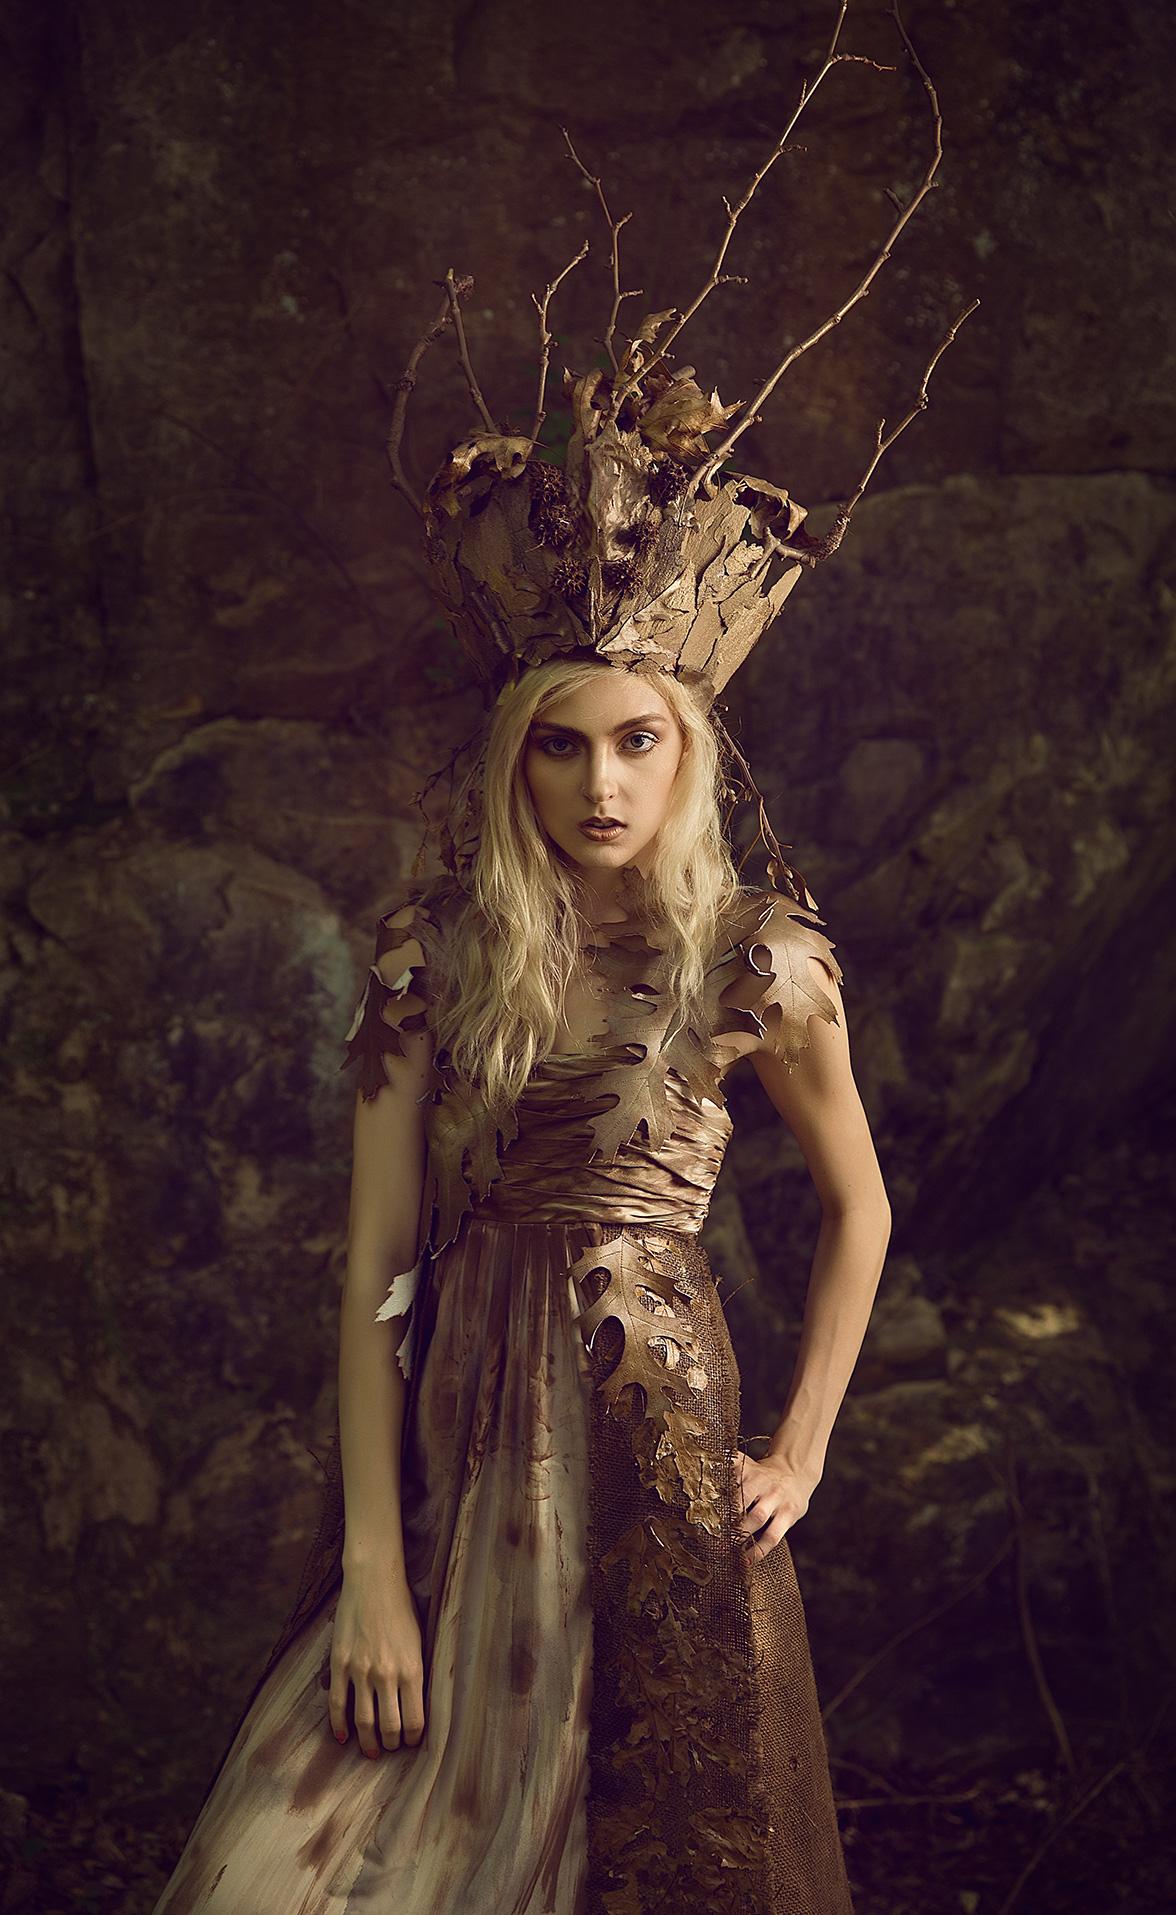 20140622_Princess_of_the_wild_Live_Work-2.jpg